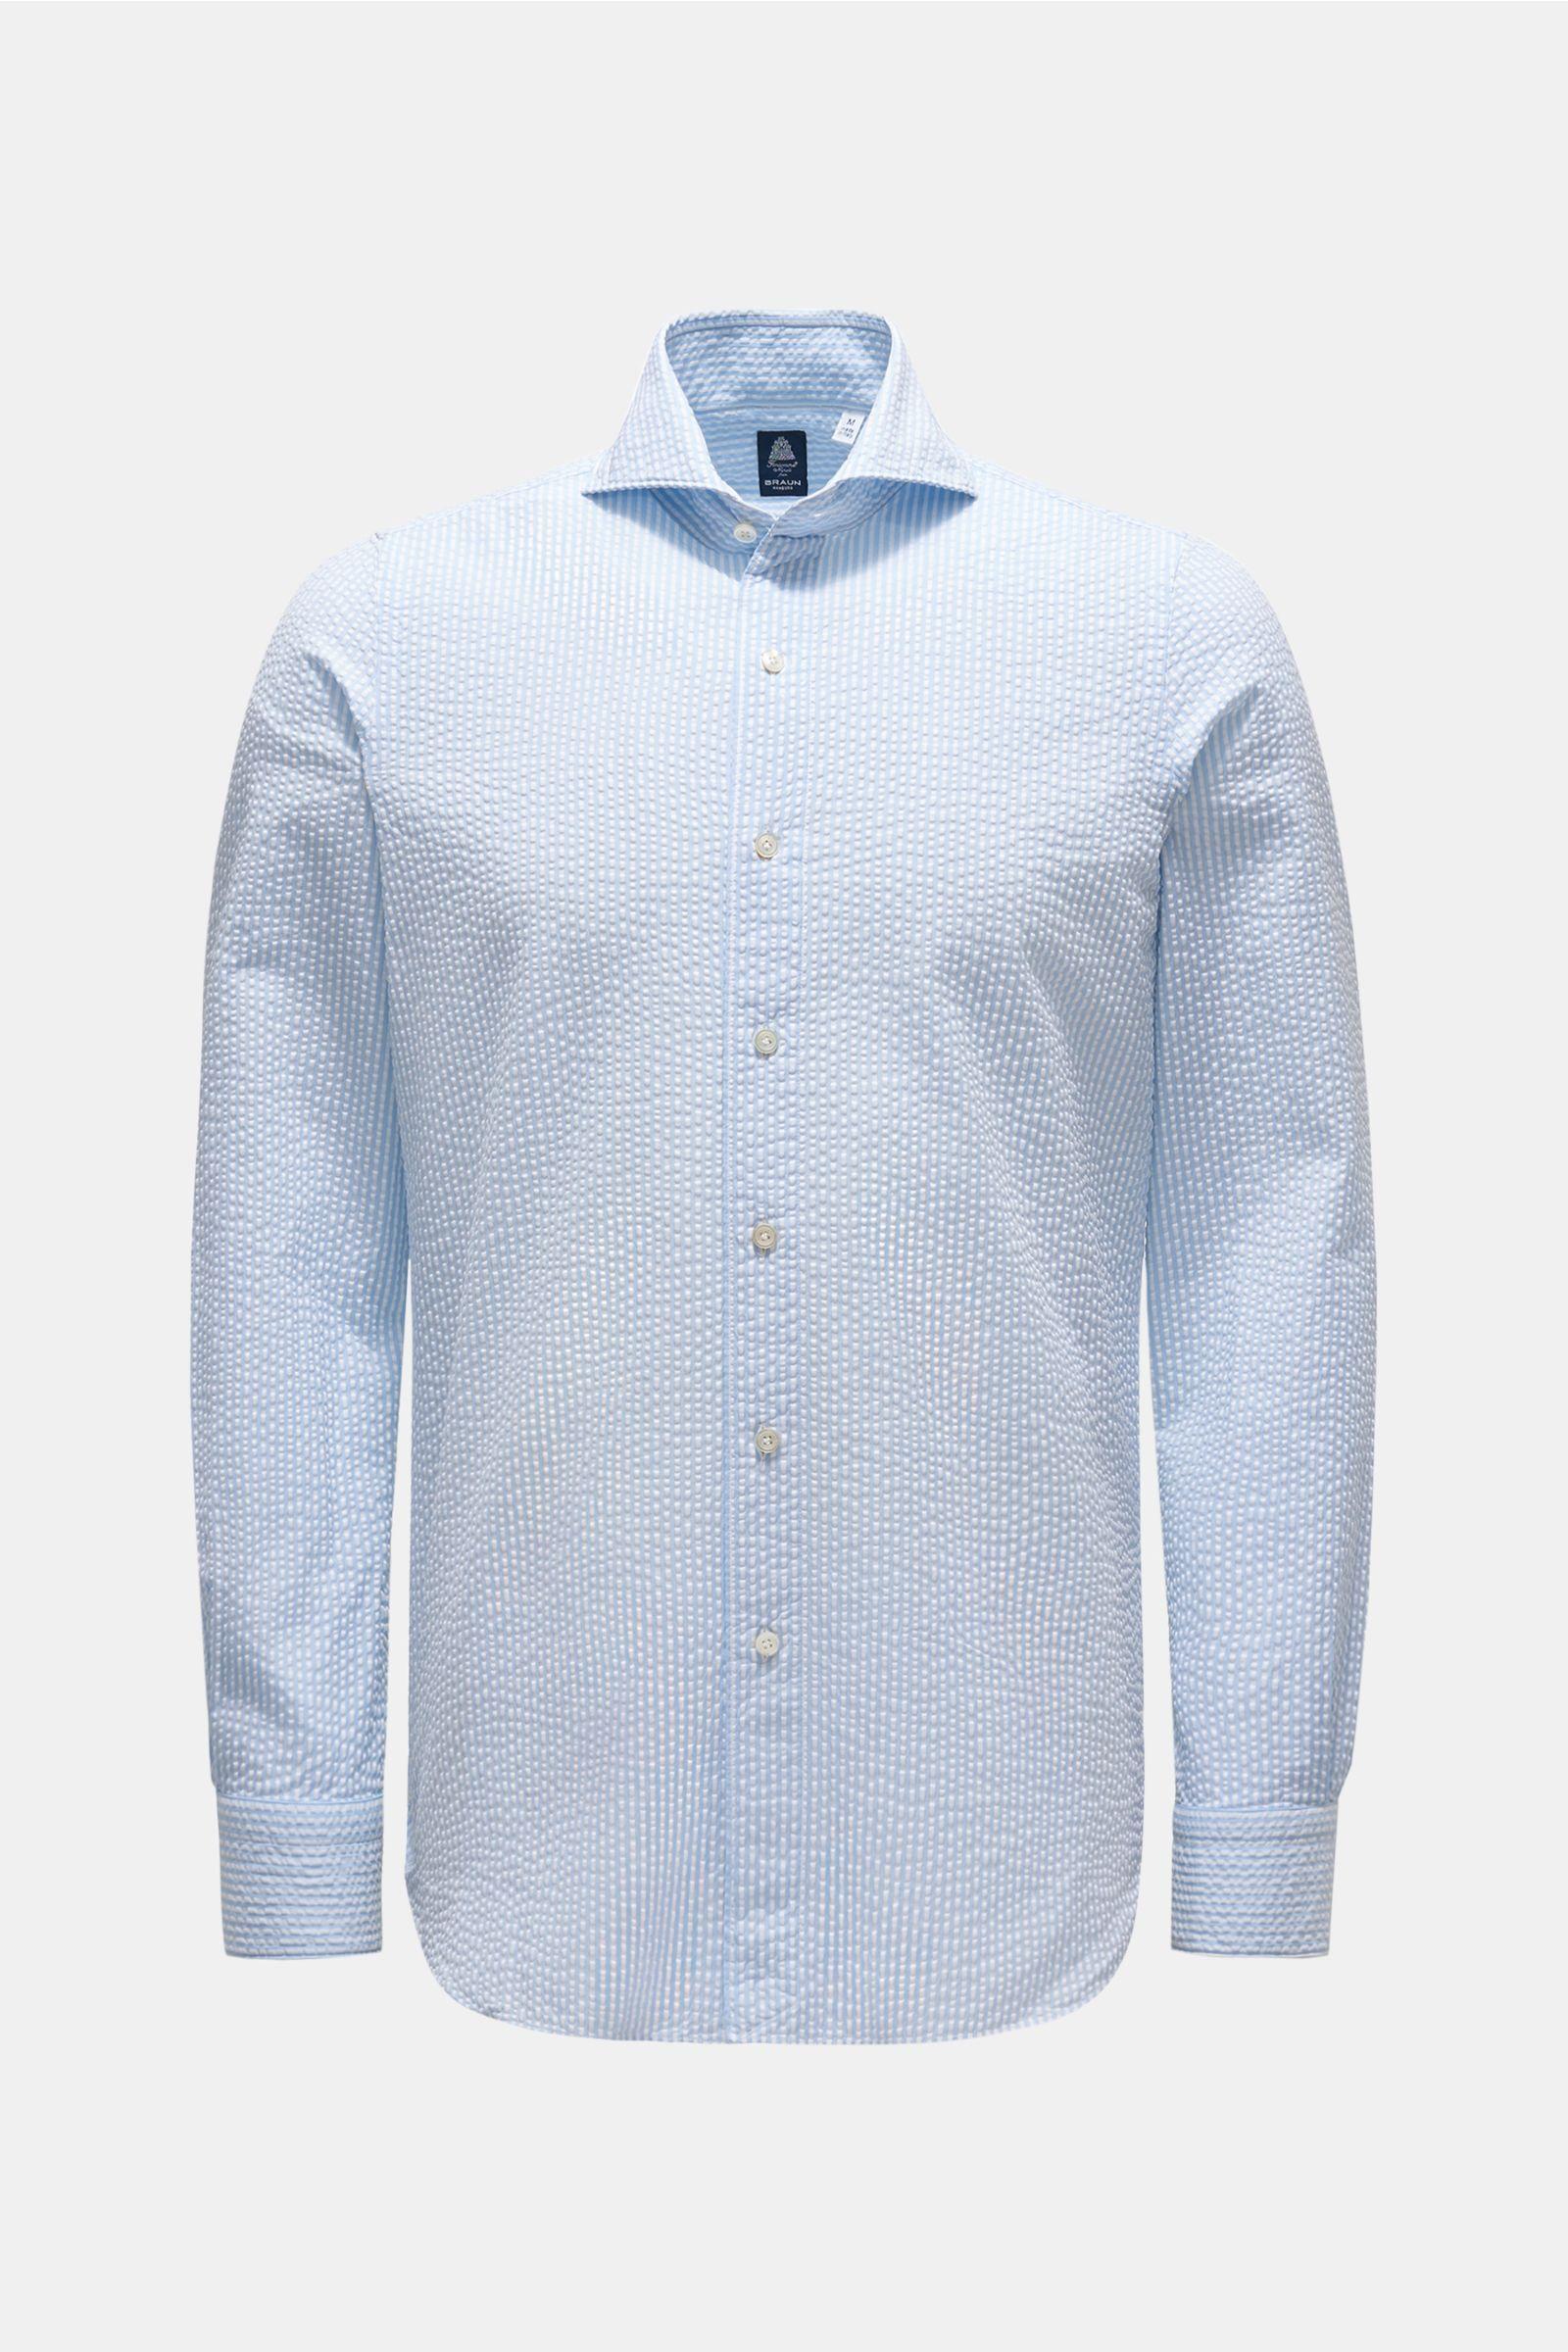 Seersucker shirt 'Sergio Gaeta' shark collar light blue/white striped